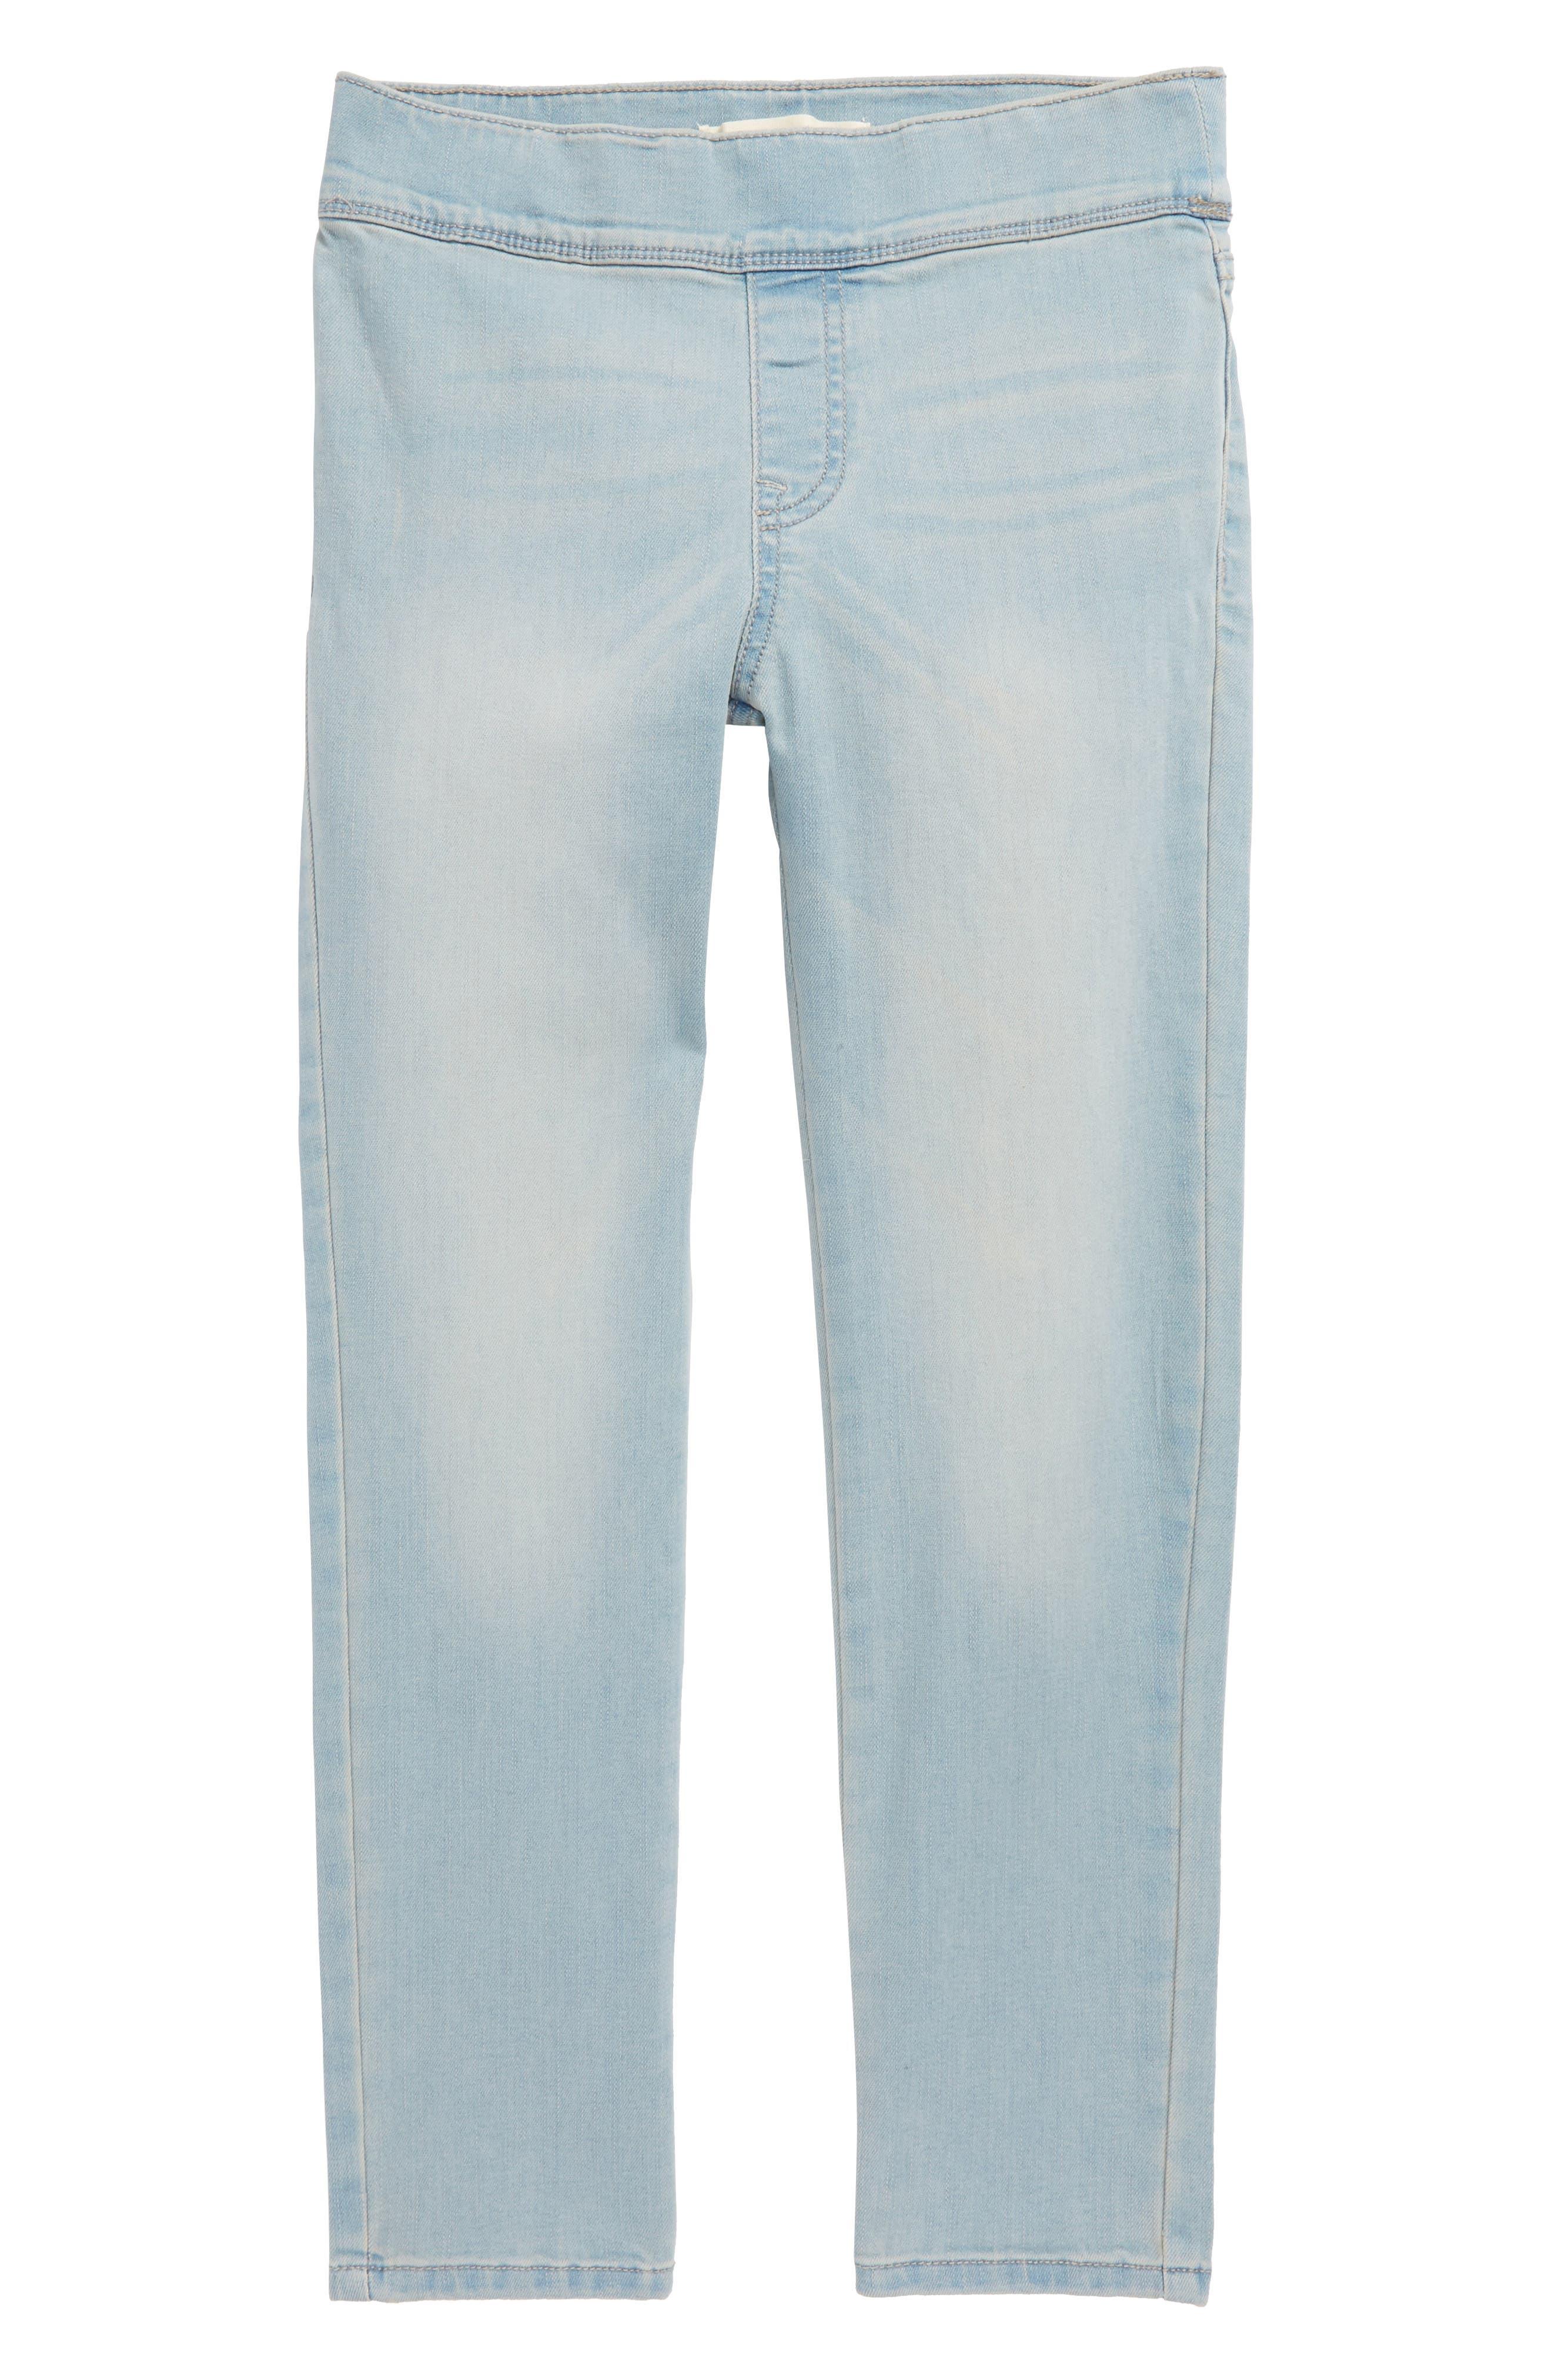 Crop Jeans,                         Main,                         color, Spring Wash